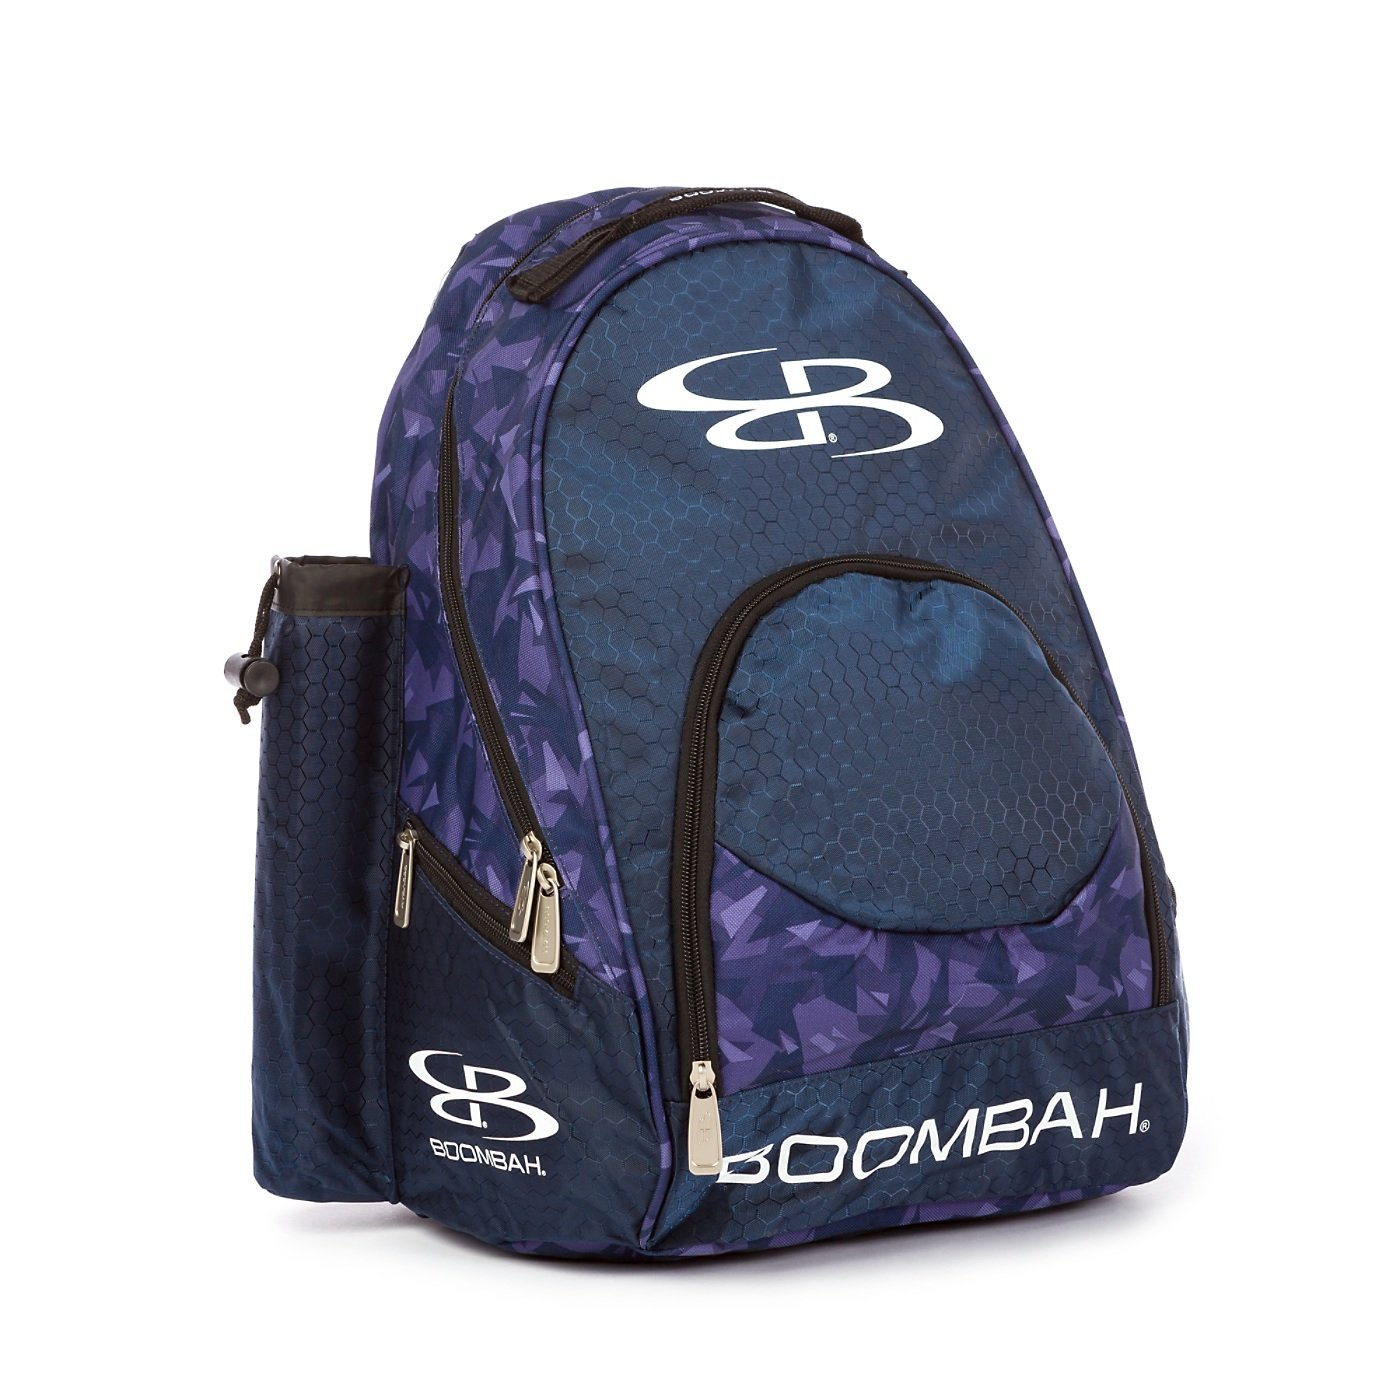 Black//Silver Boombah Tyro Baseball//Softball Bat Backpack Holds 2 Bats up to Barrel Size of 2-5//8 20 x 15 x 10